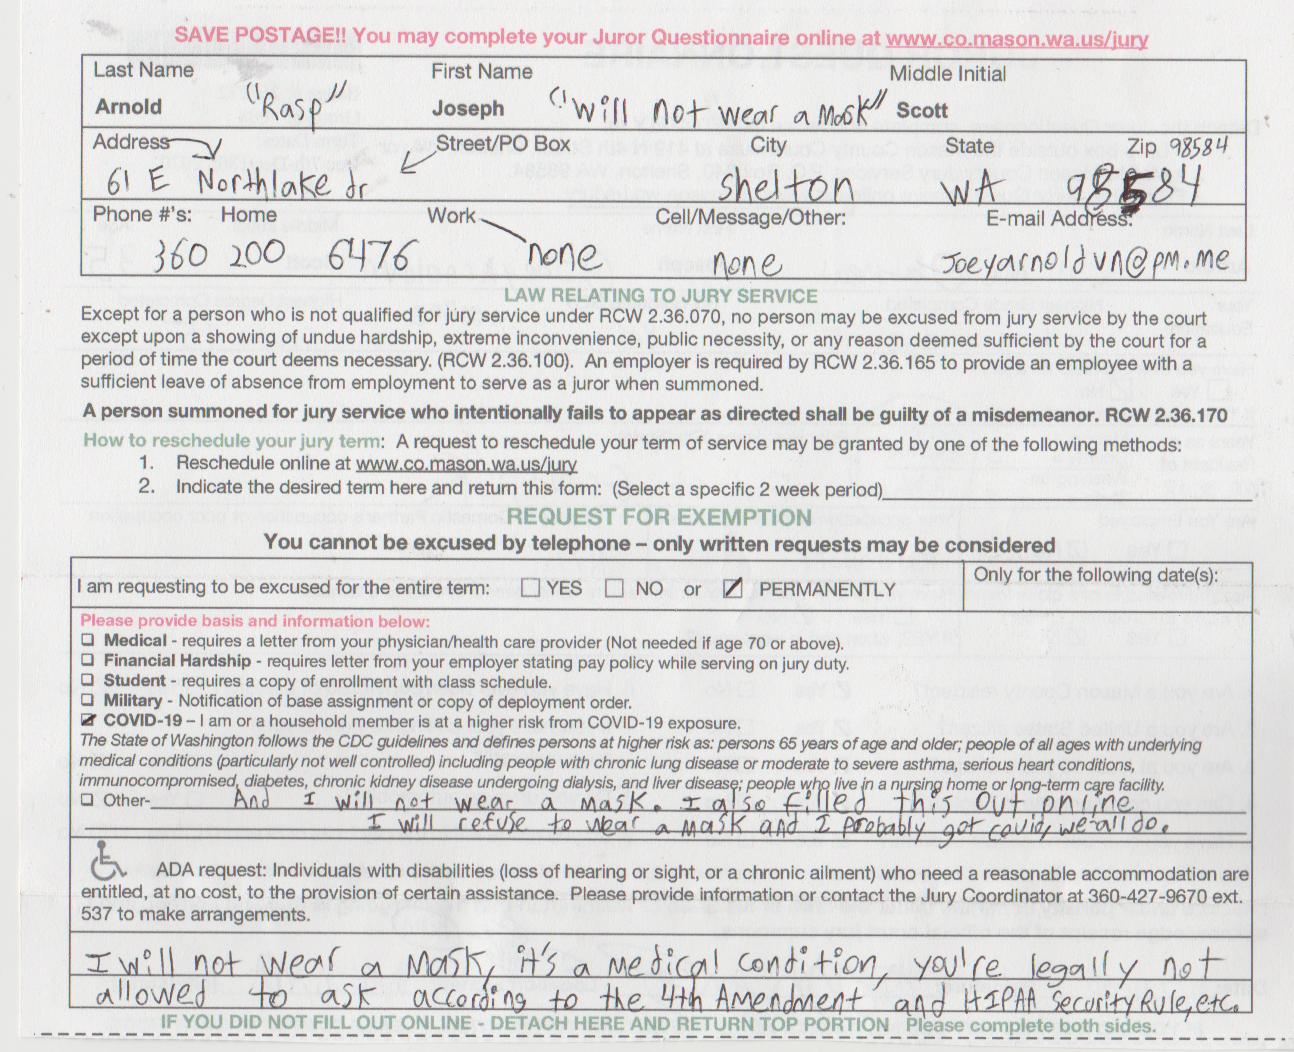 2020-11-07 - Saturday - 03:00 PM LMS JA - Jury Duty Request - Shelton WA - Form & Survey Pages Update Again-2.png